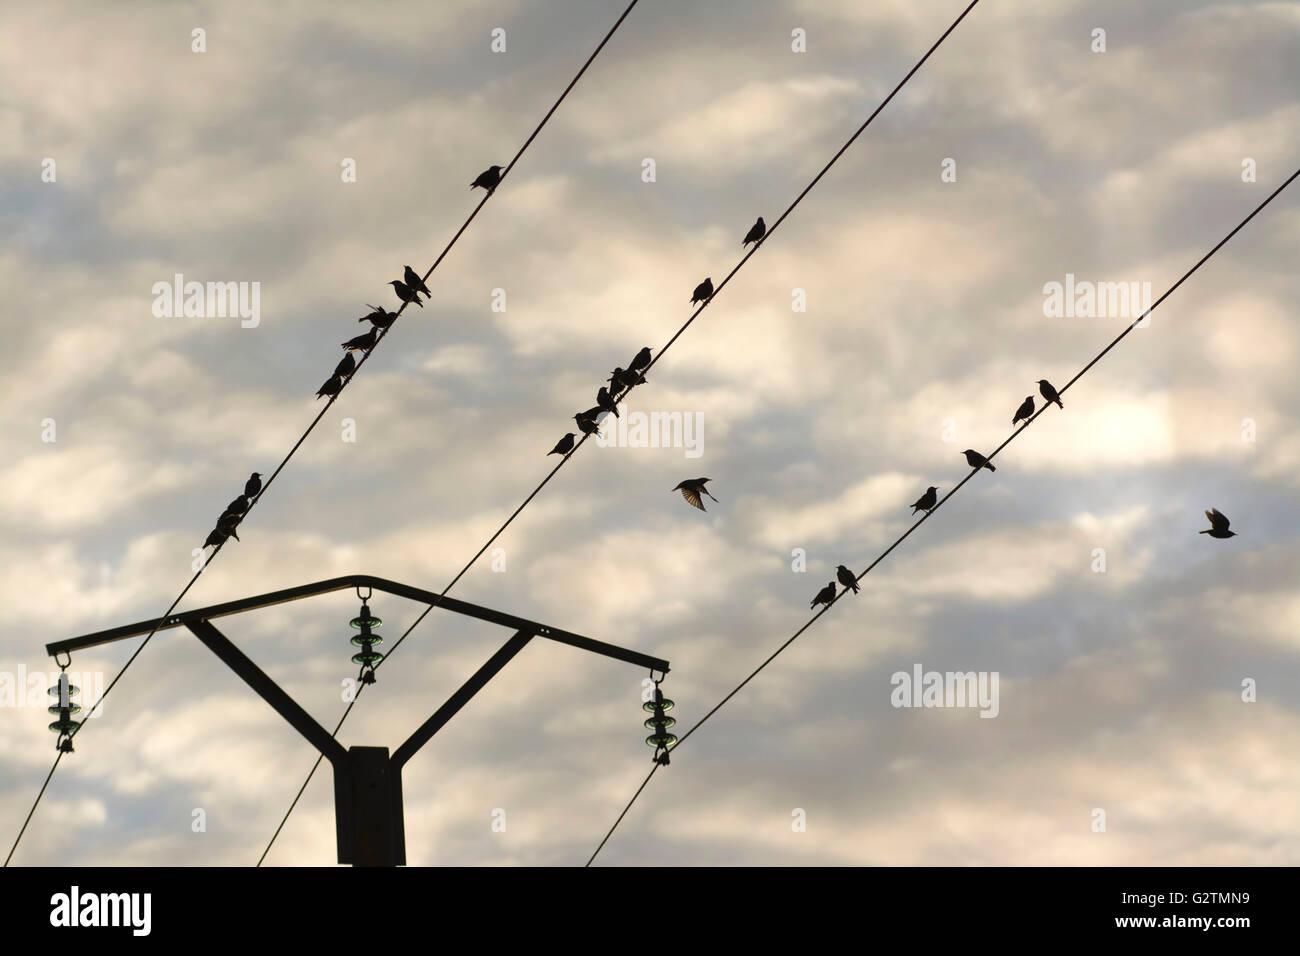 Birds on a telephone pole wire, Puy de Dome, Auvergne, France Stock ...